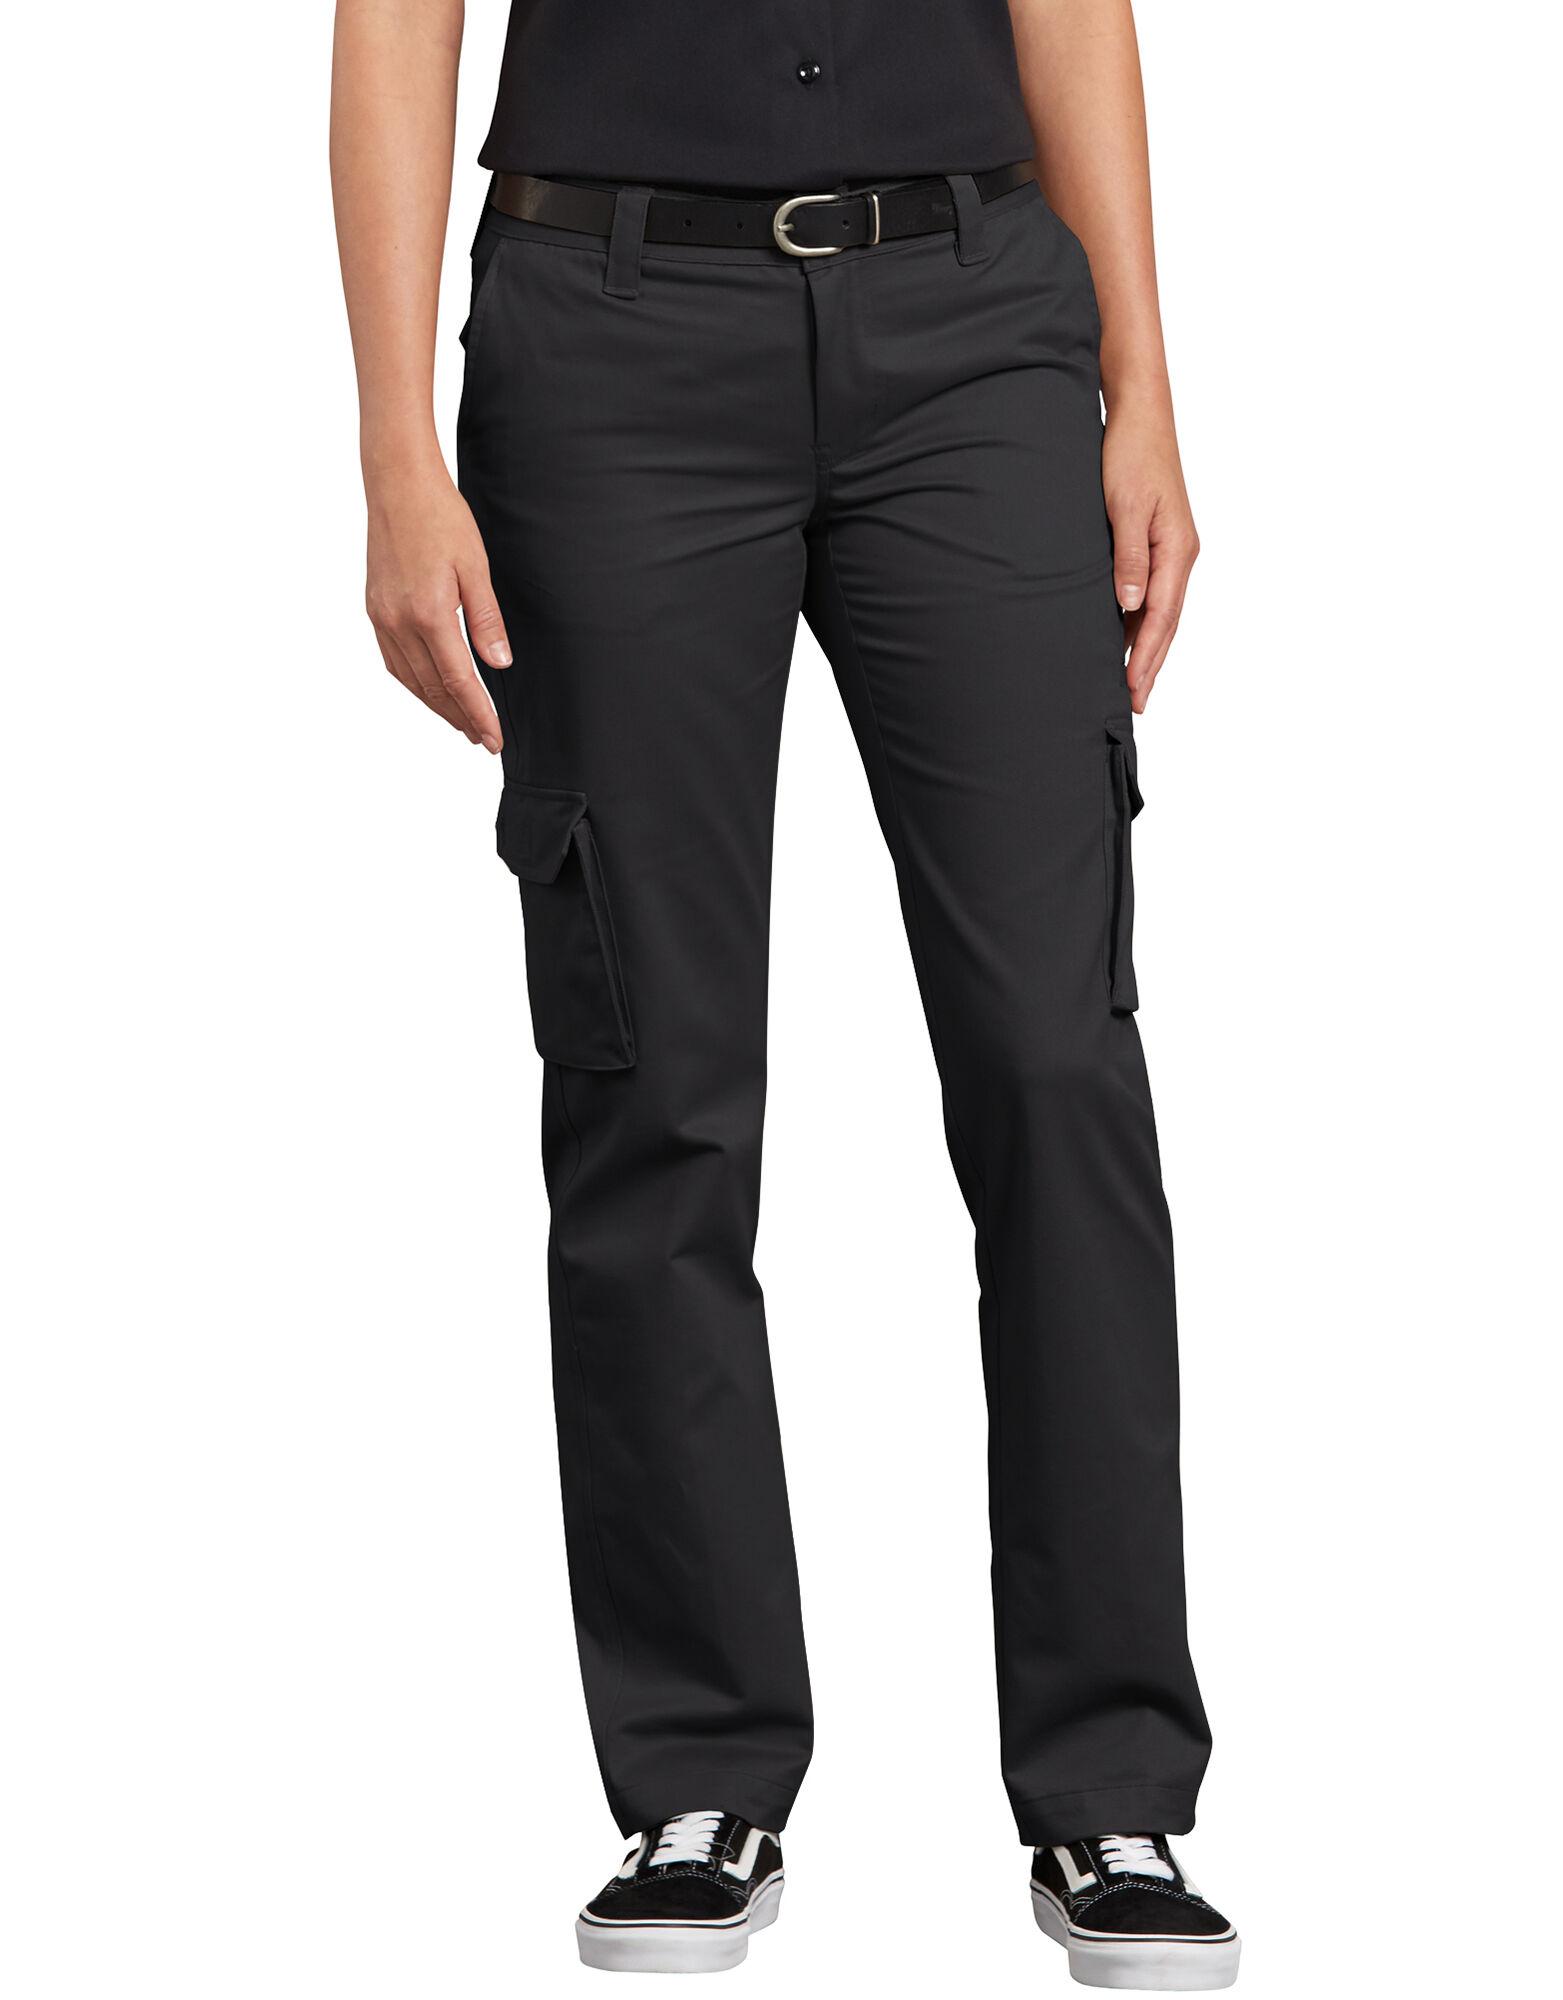 Spring winter blue black cargo pants women Loose high ...  |Black Cargo Pants For Girls